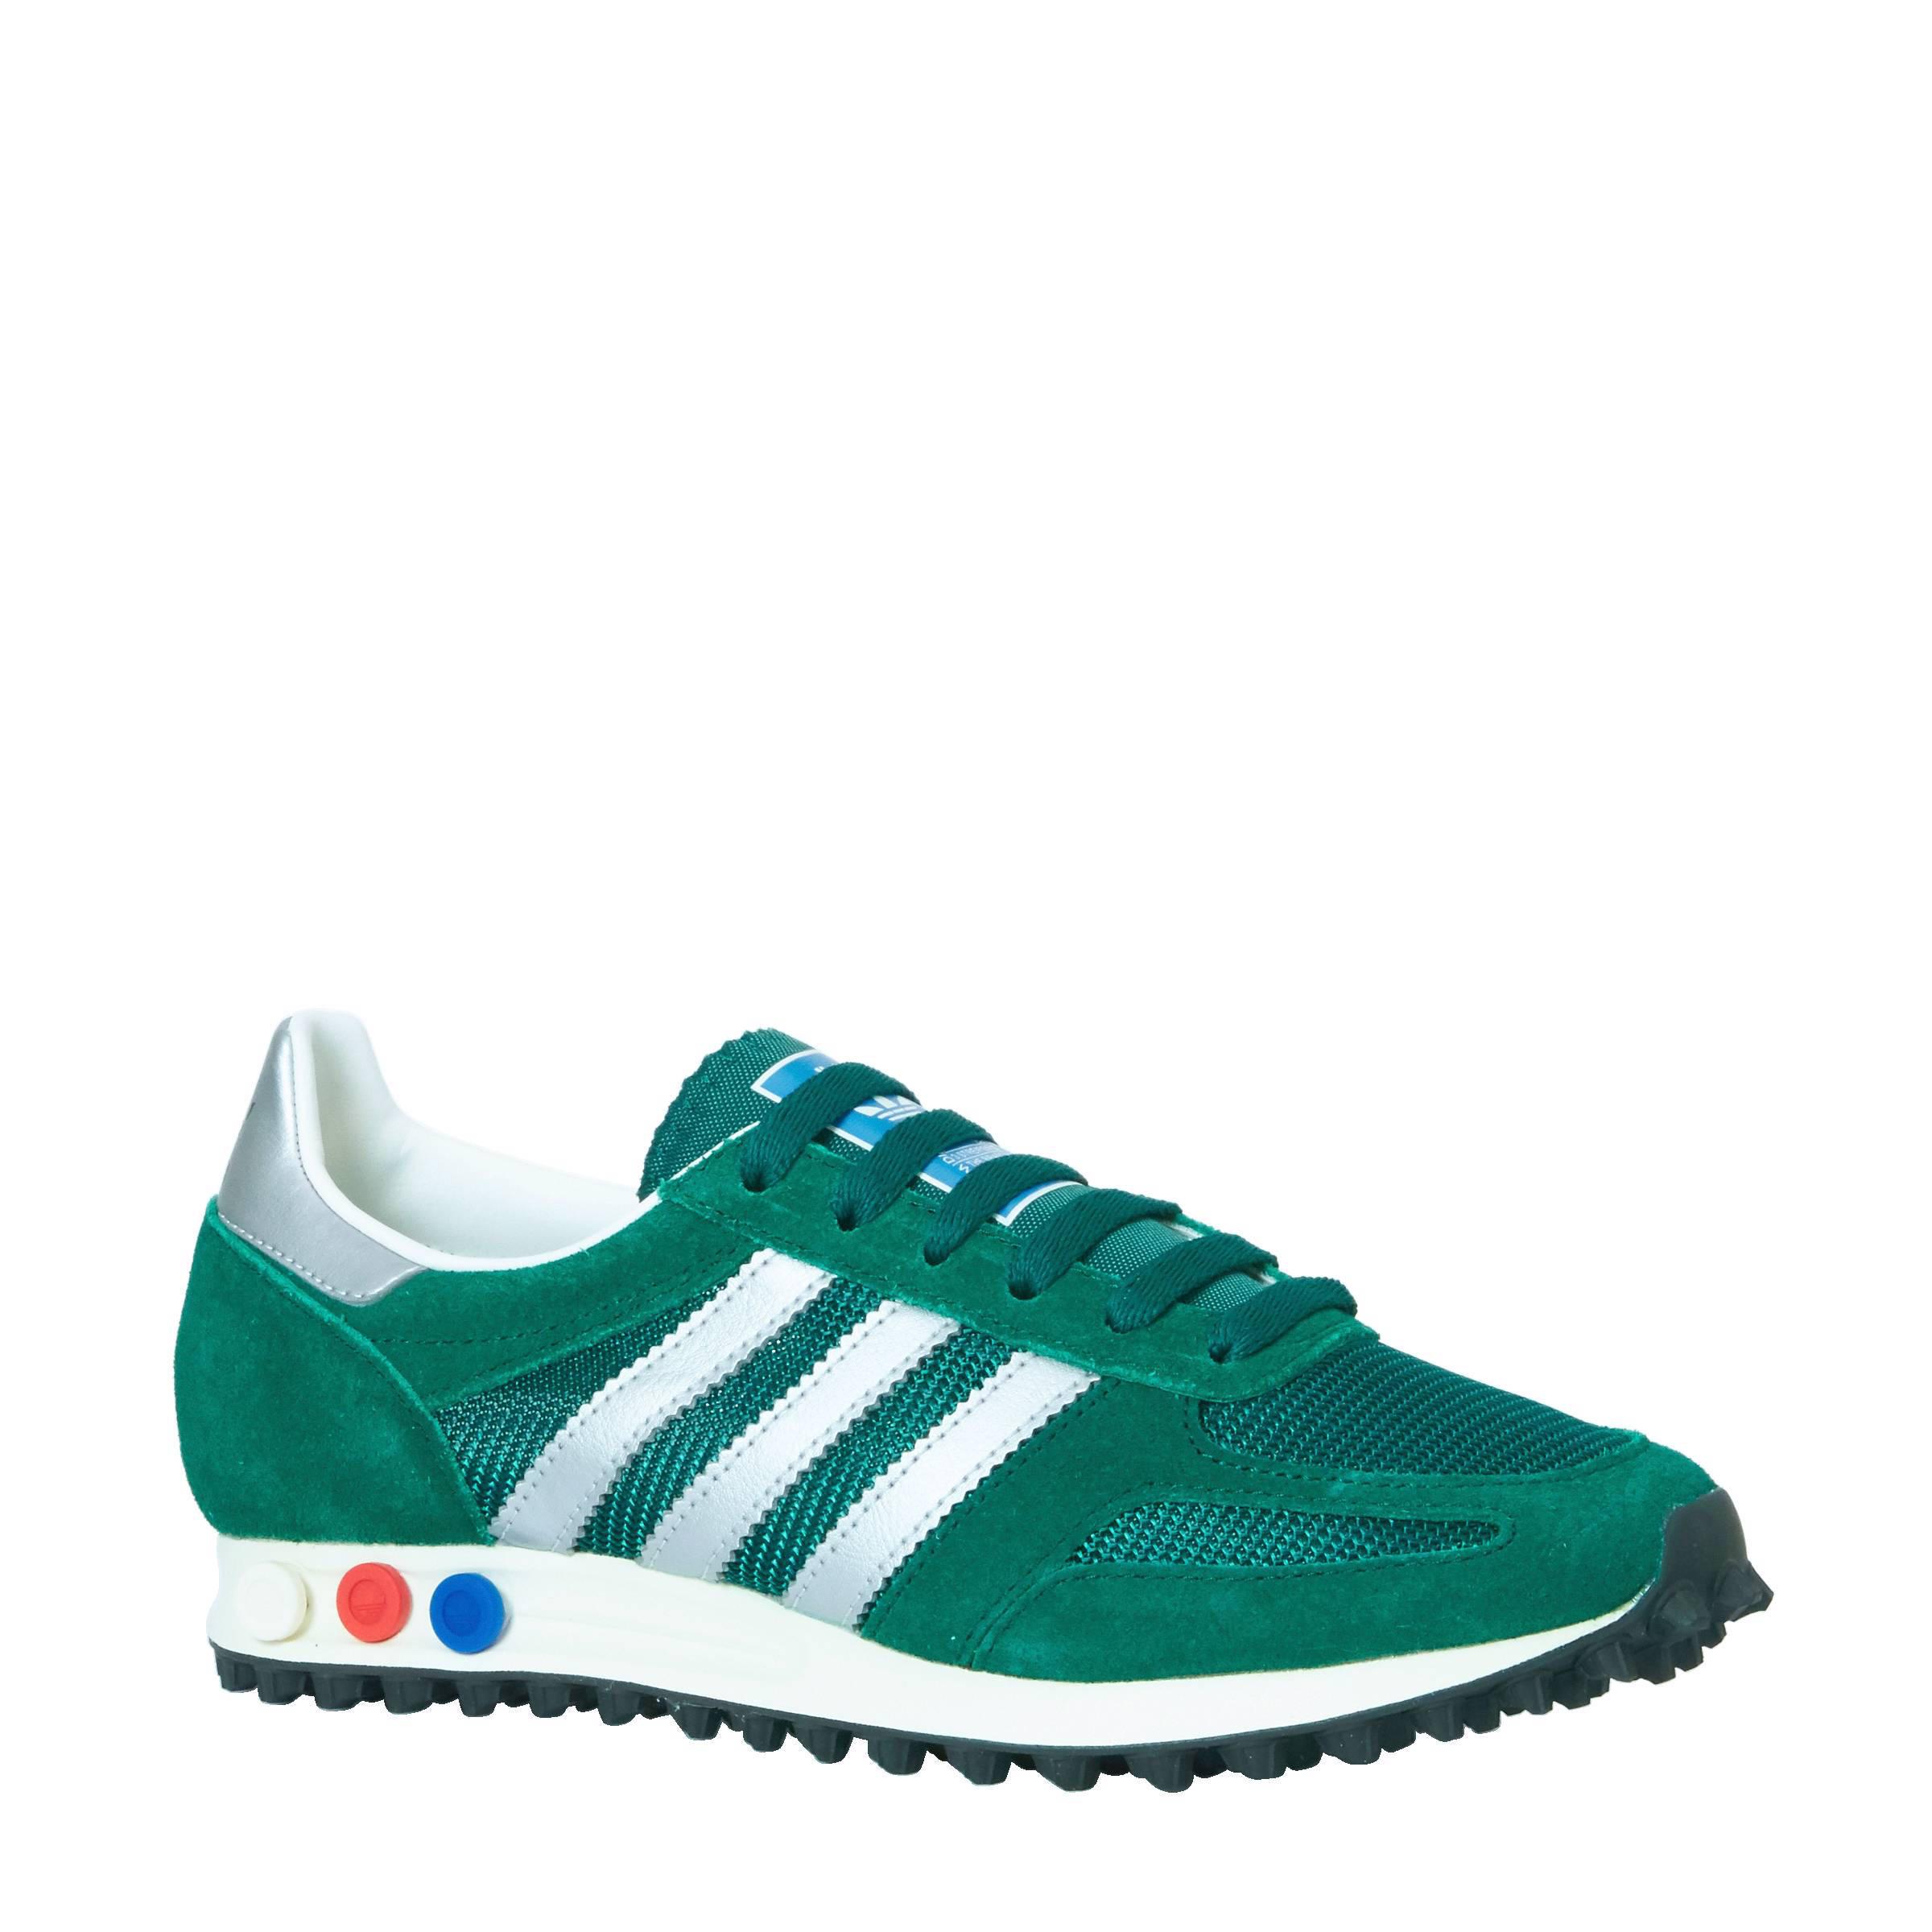 adidas Originals LA Trainer OG sneakers